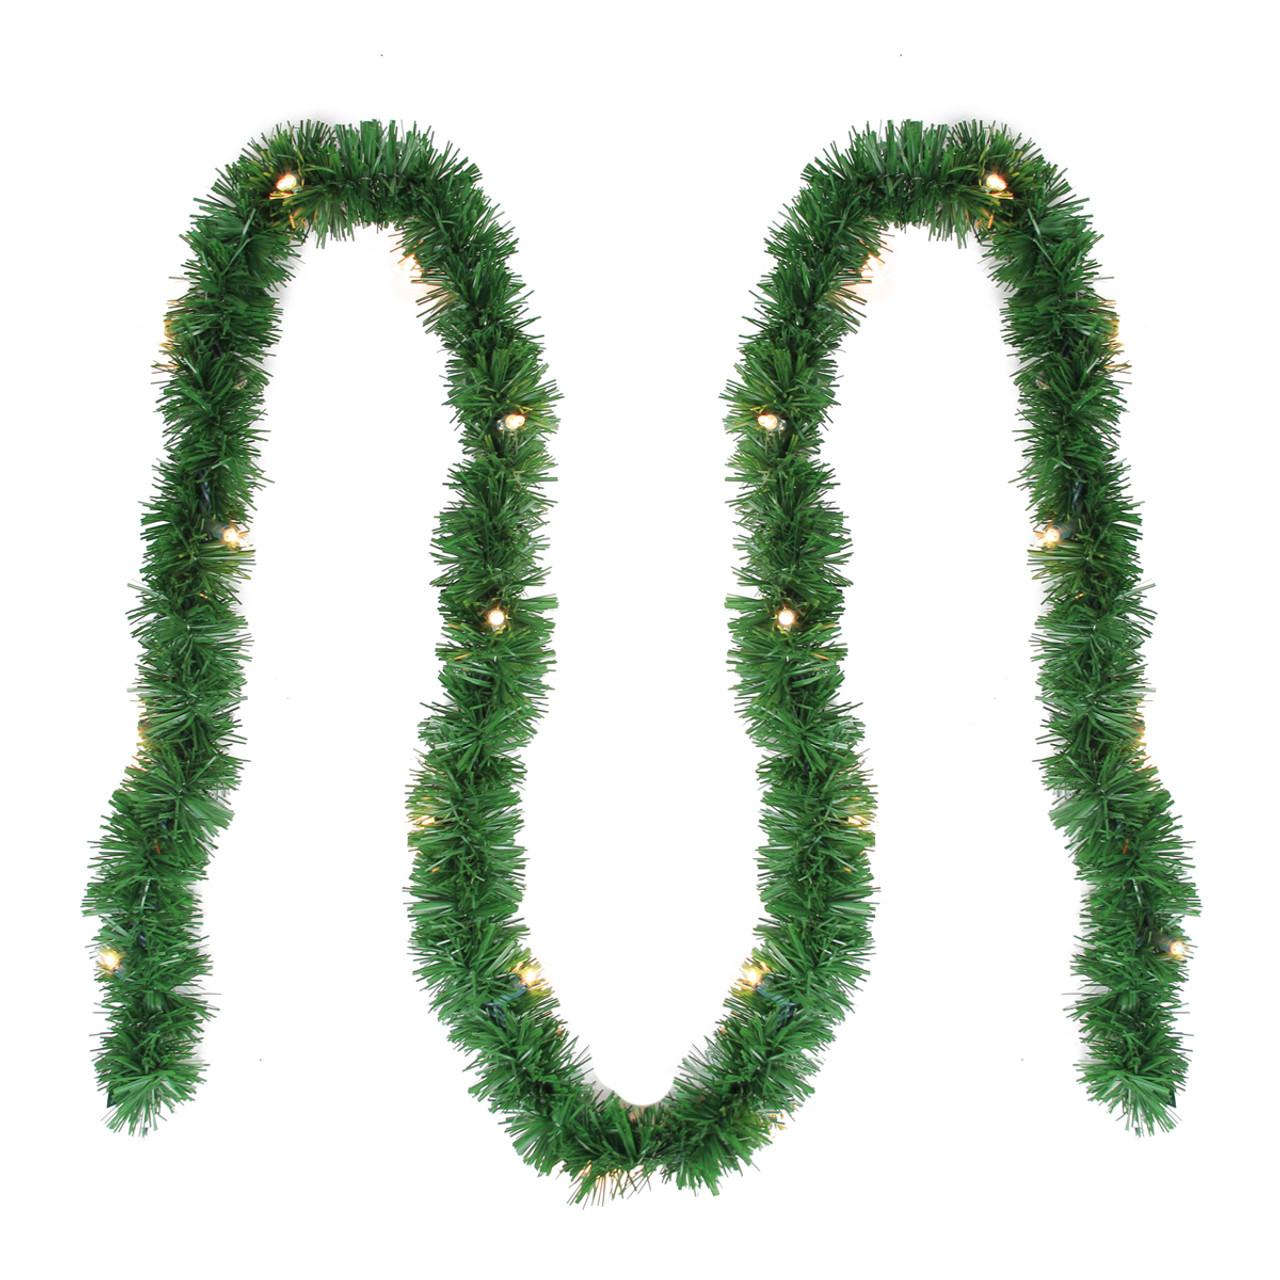 12 x 2 5 pre lit green pine artificial christmas garland clear